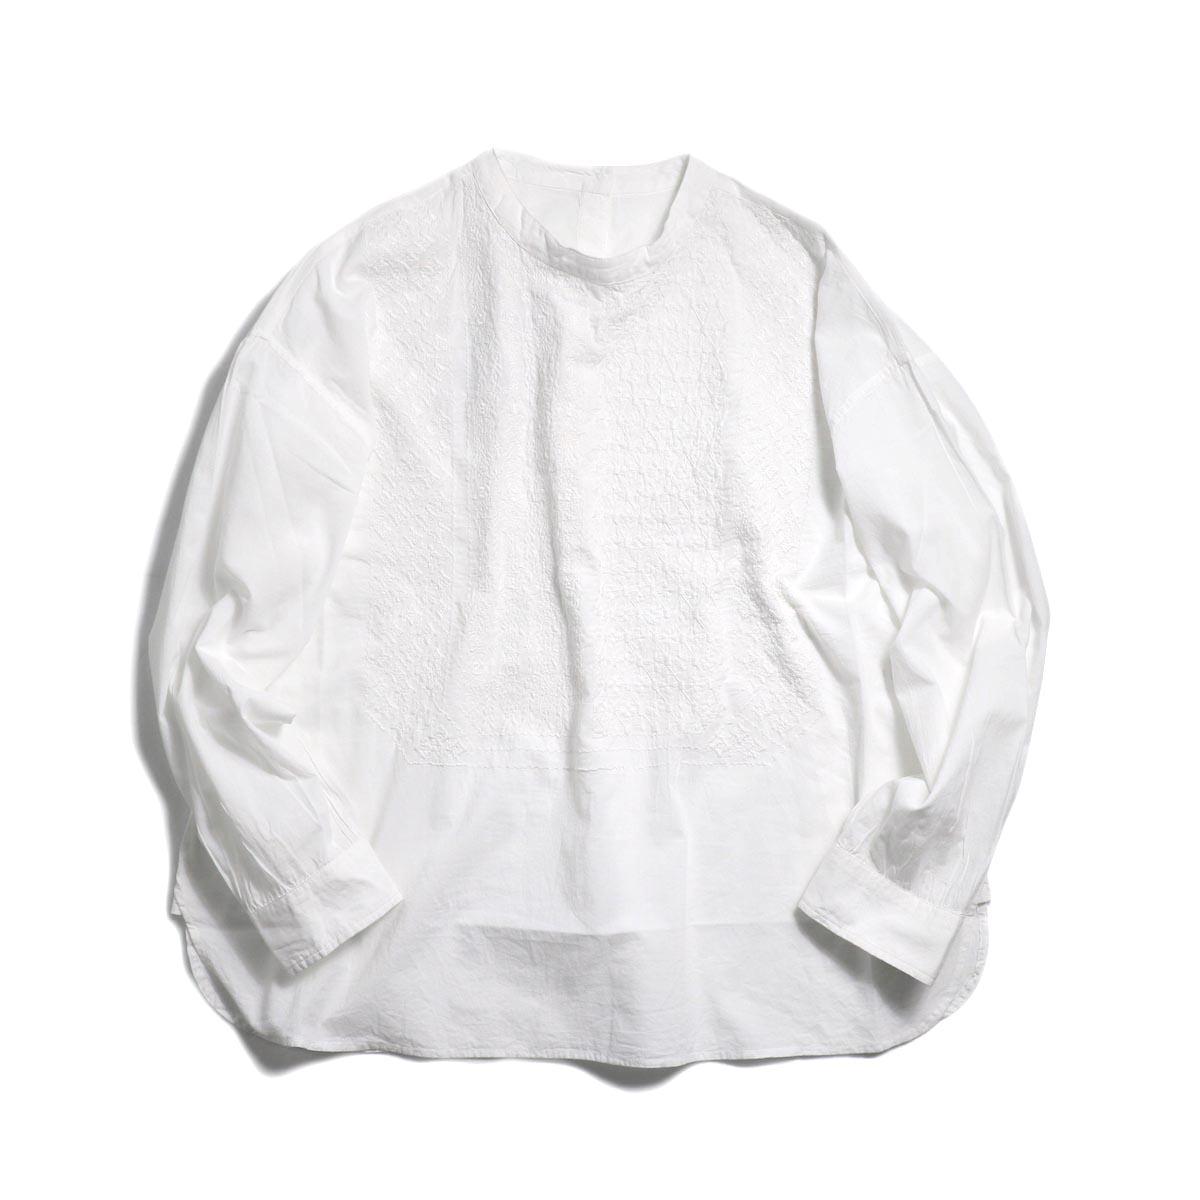 maison de soil / Pullover Stand Collar Emb Shirt -White